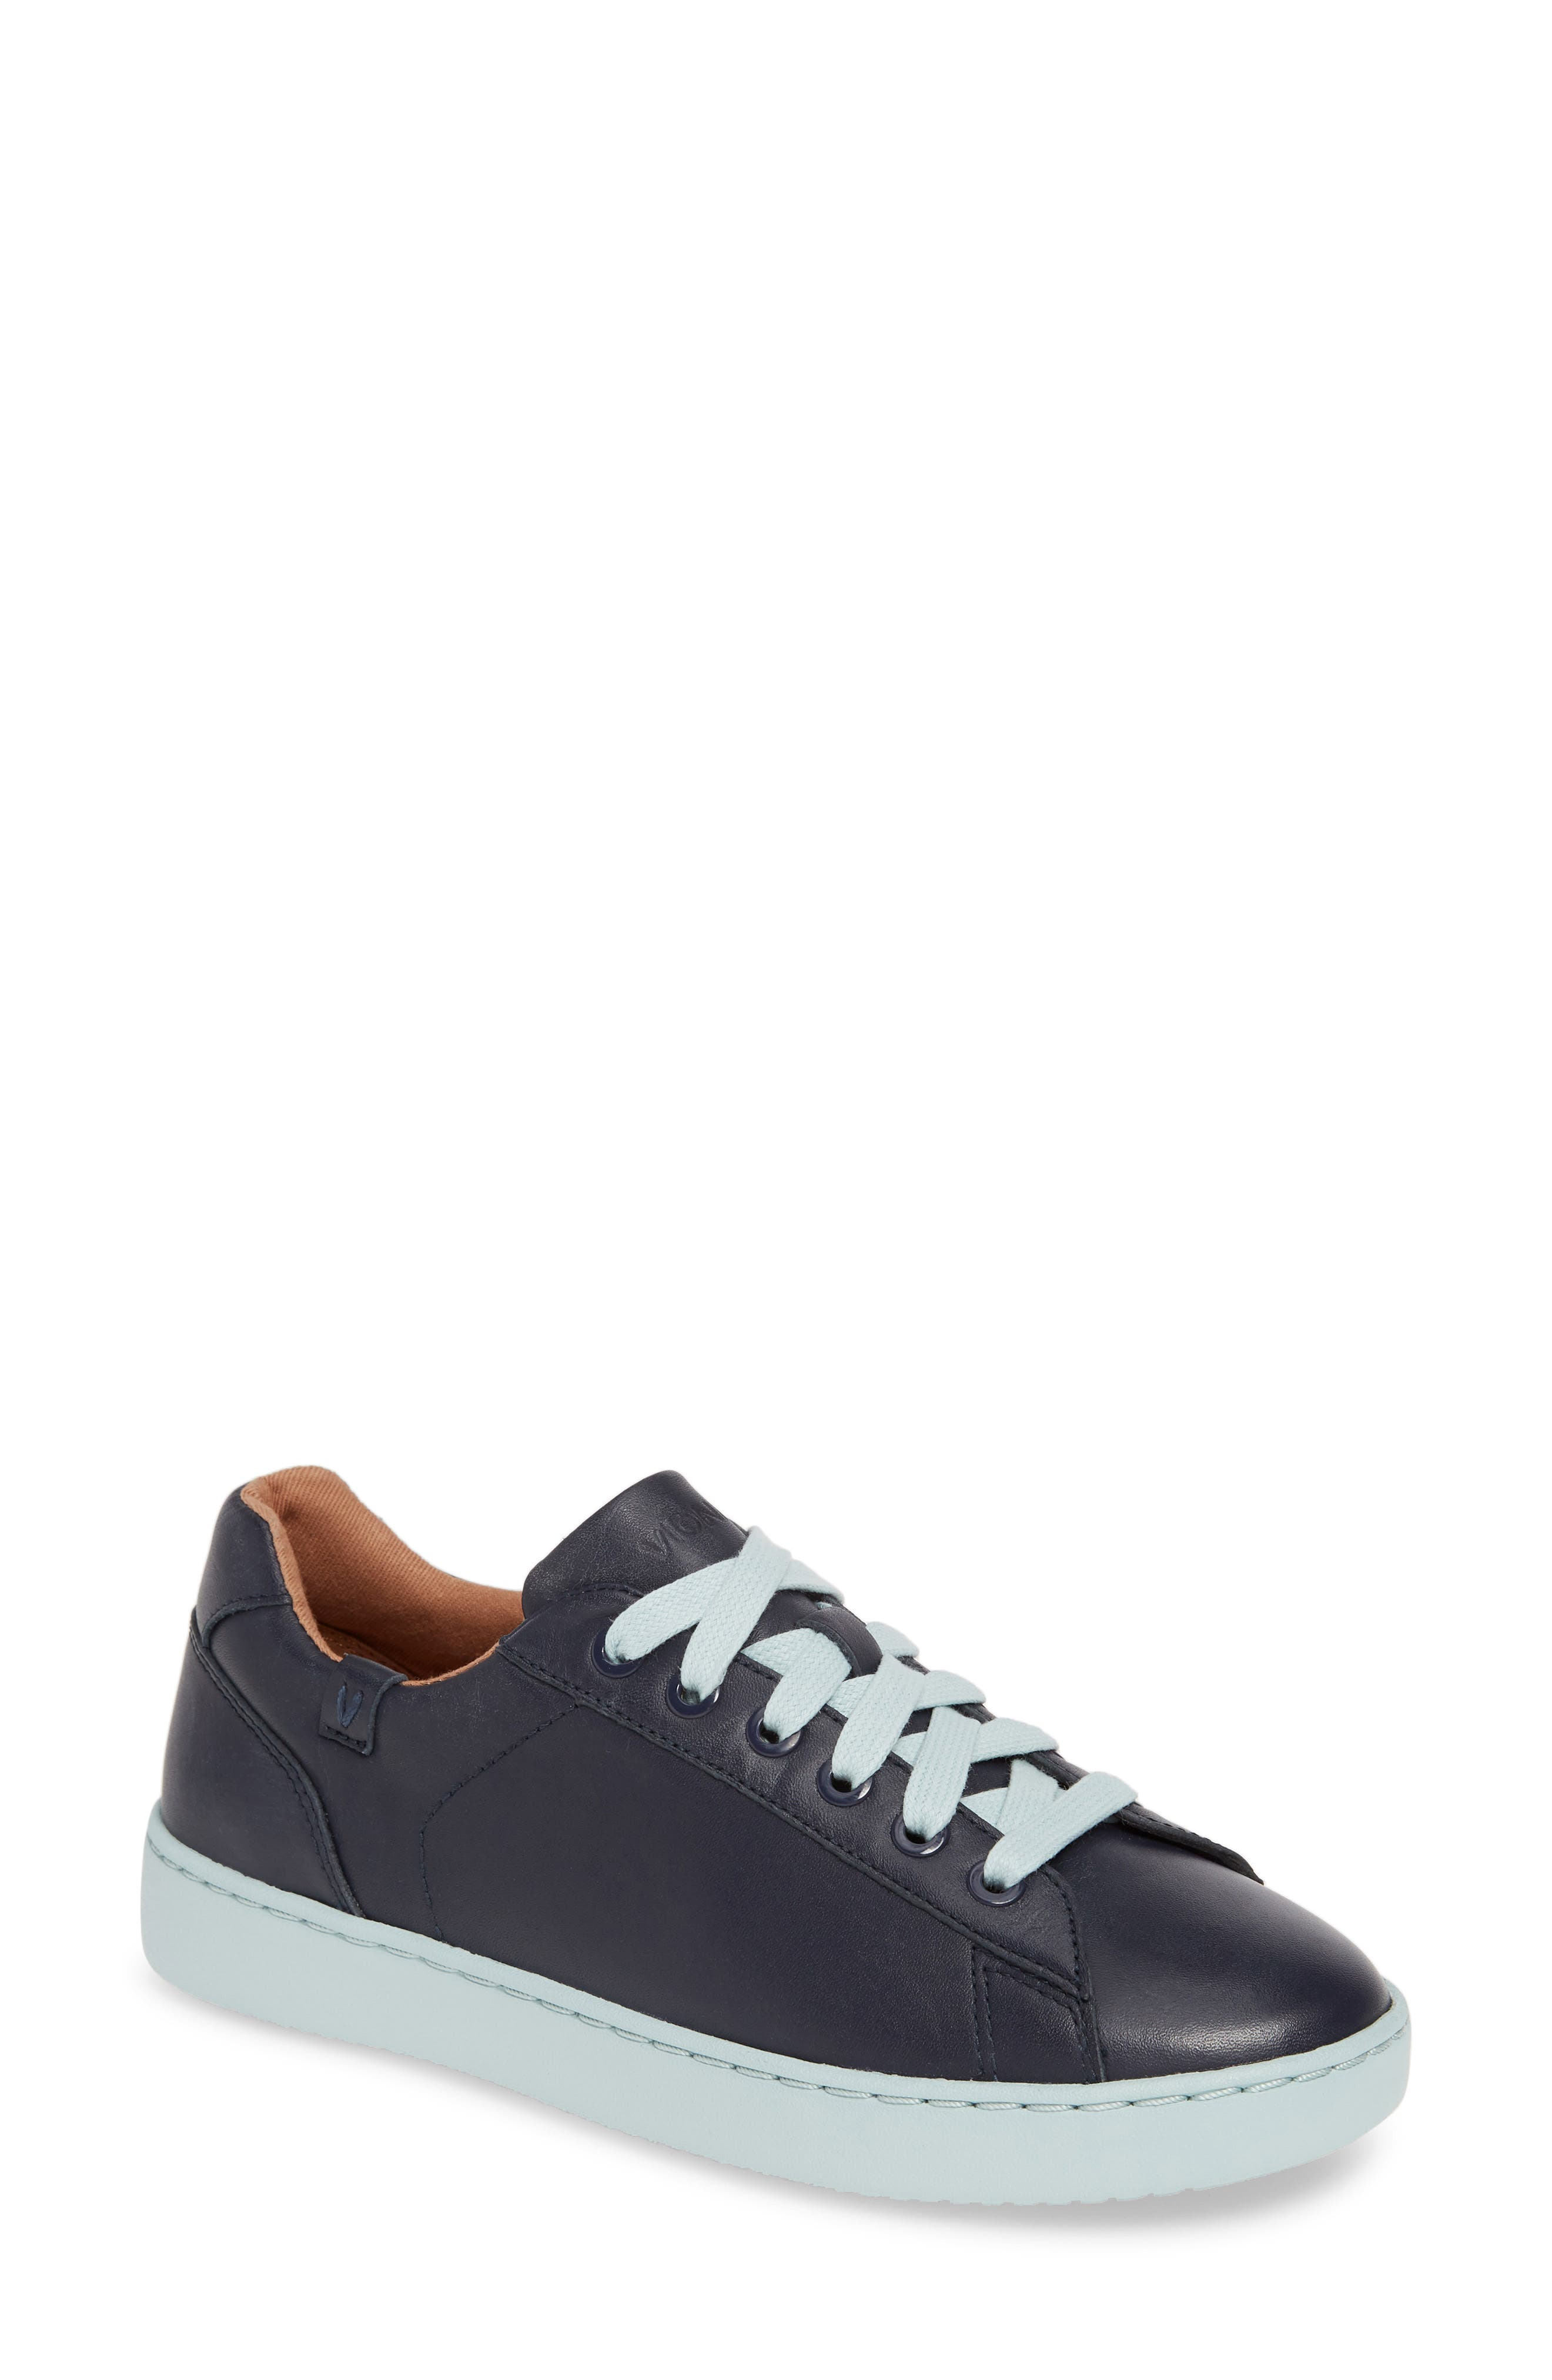 Vionic Mable Sneaker, Blue